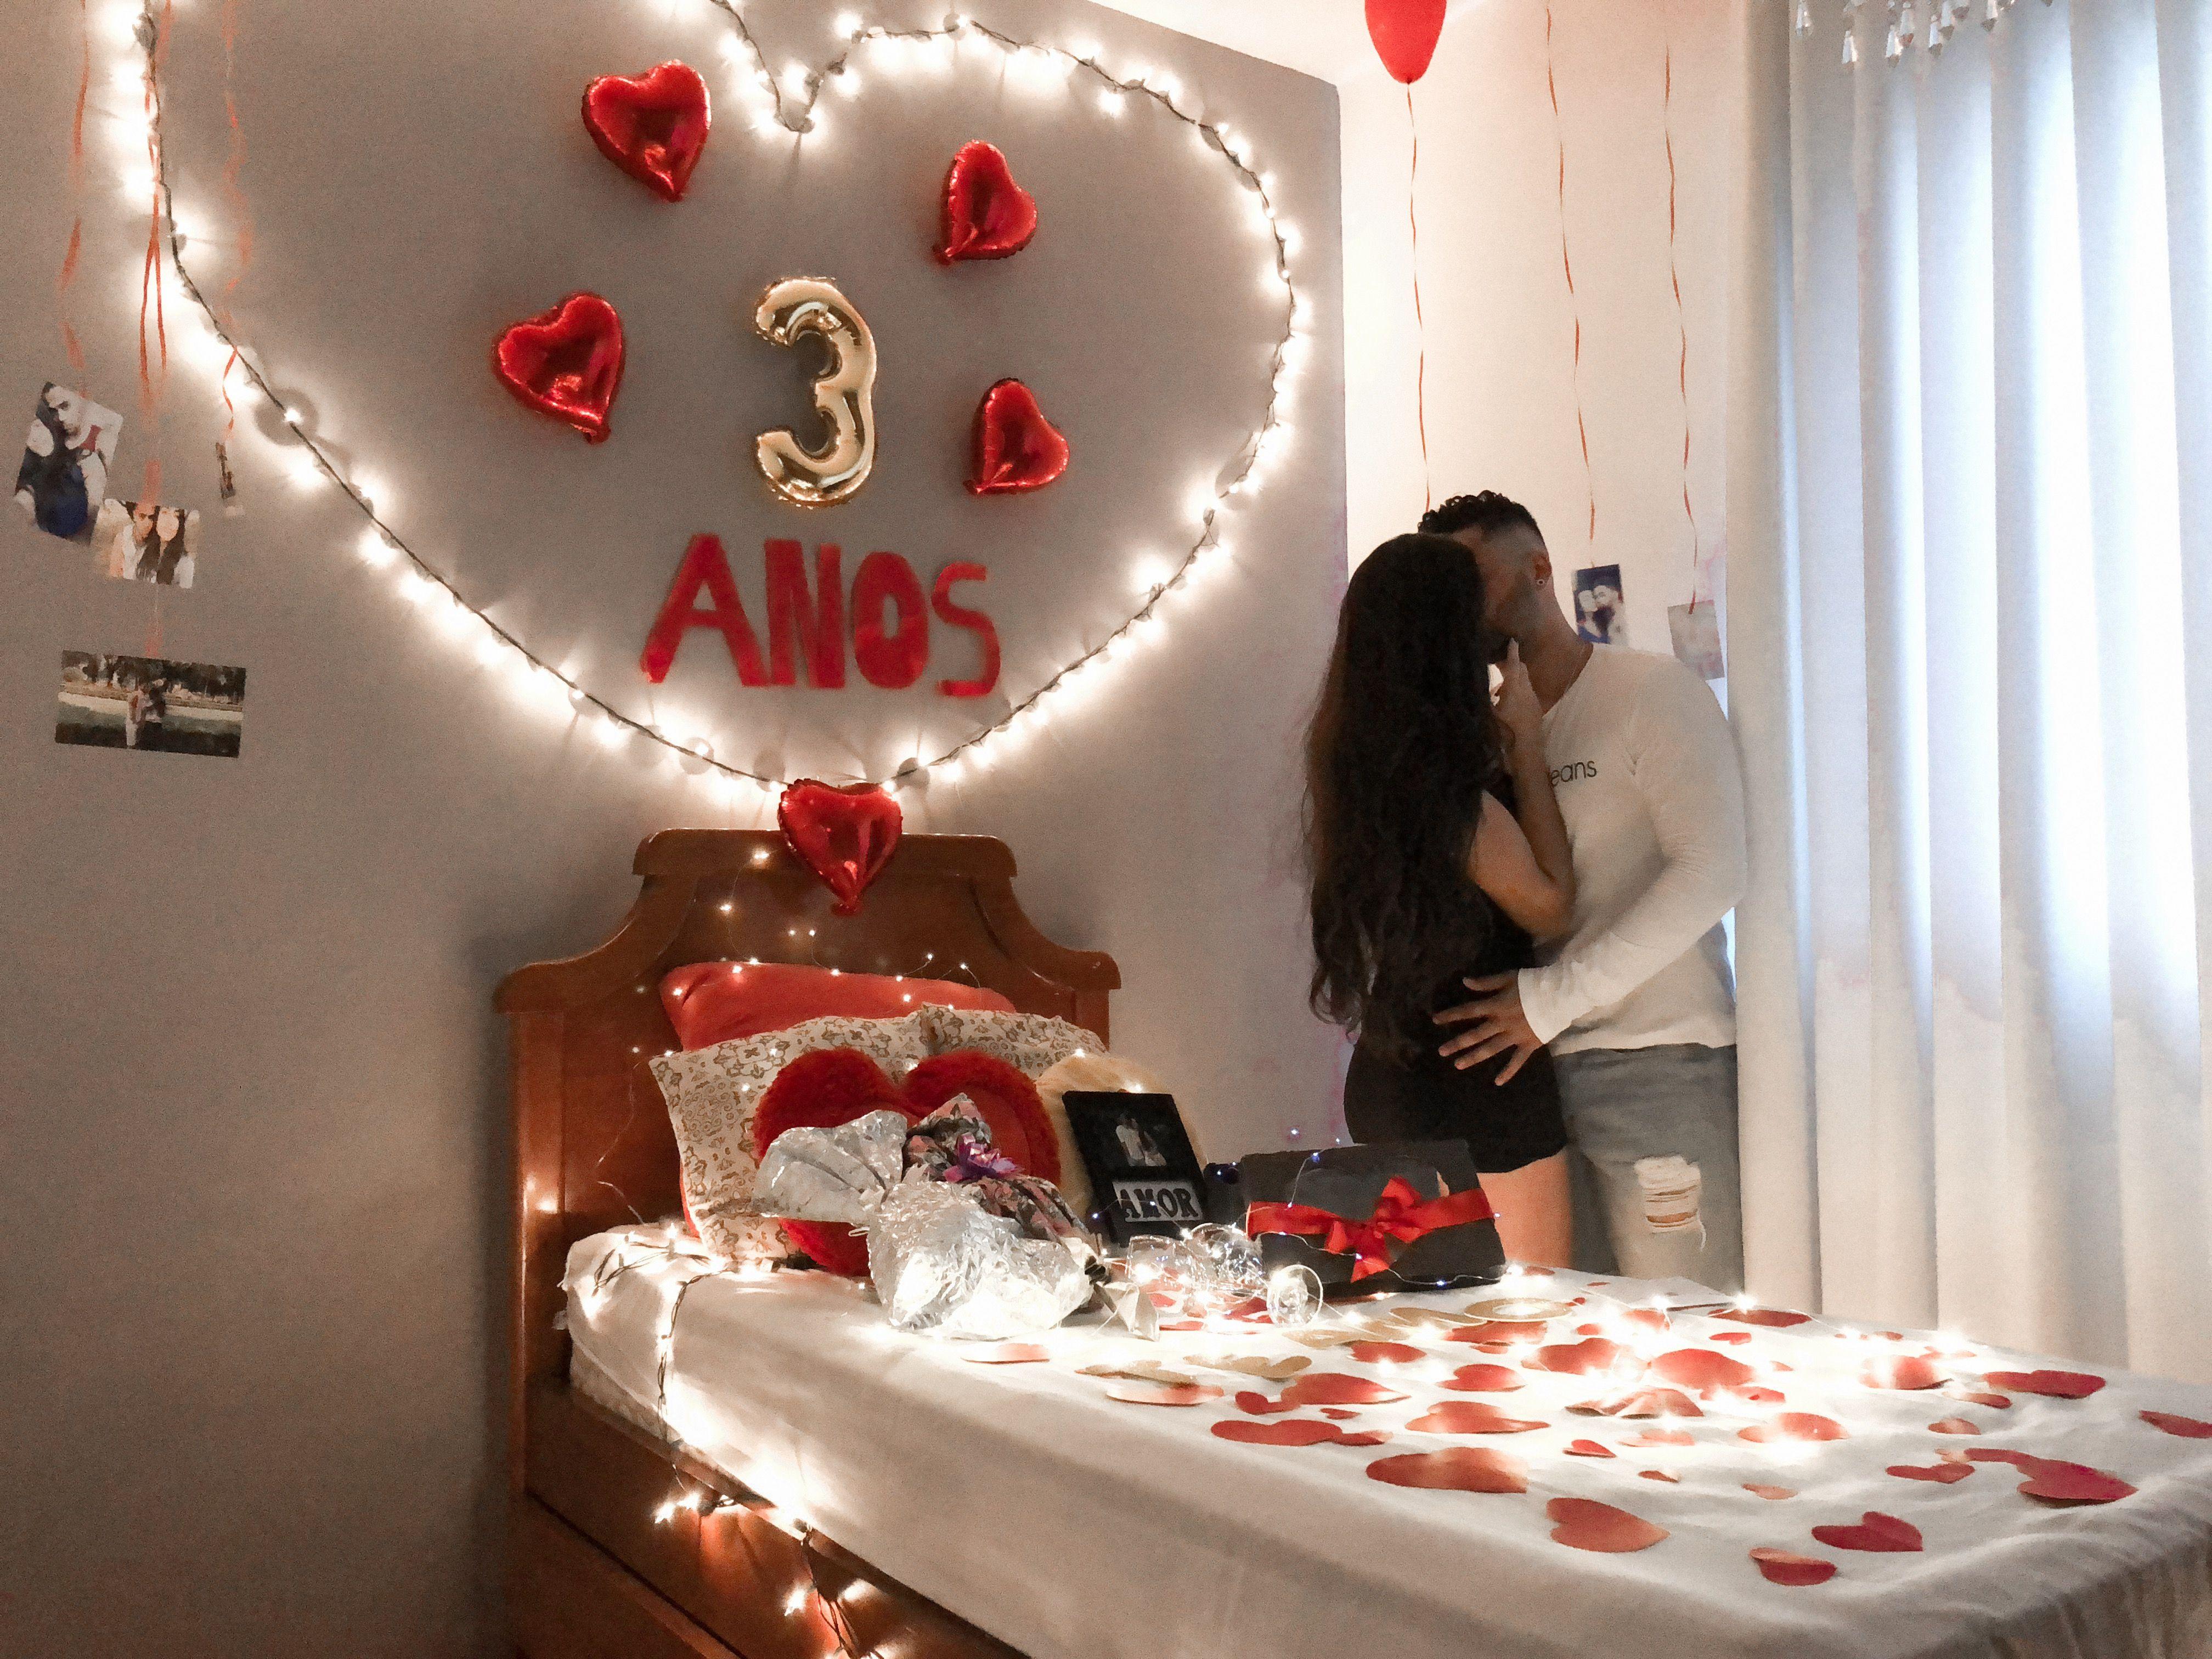 Enfeitando o quarto da namorada